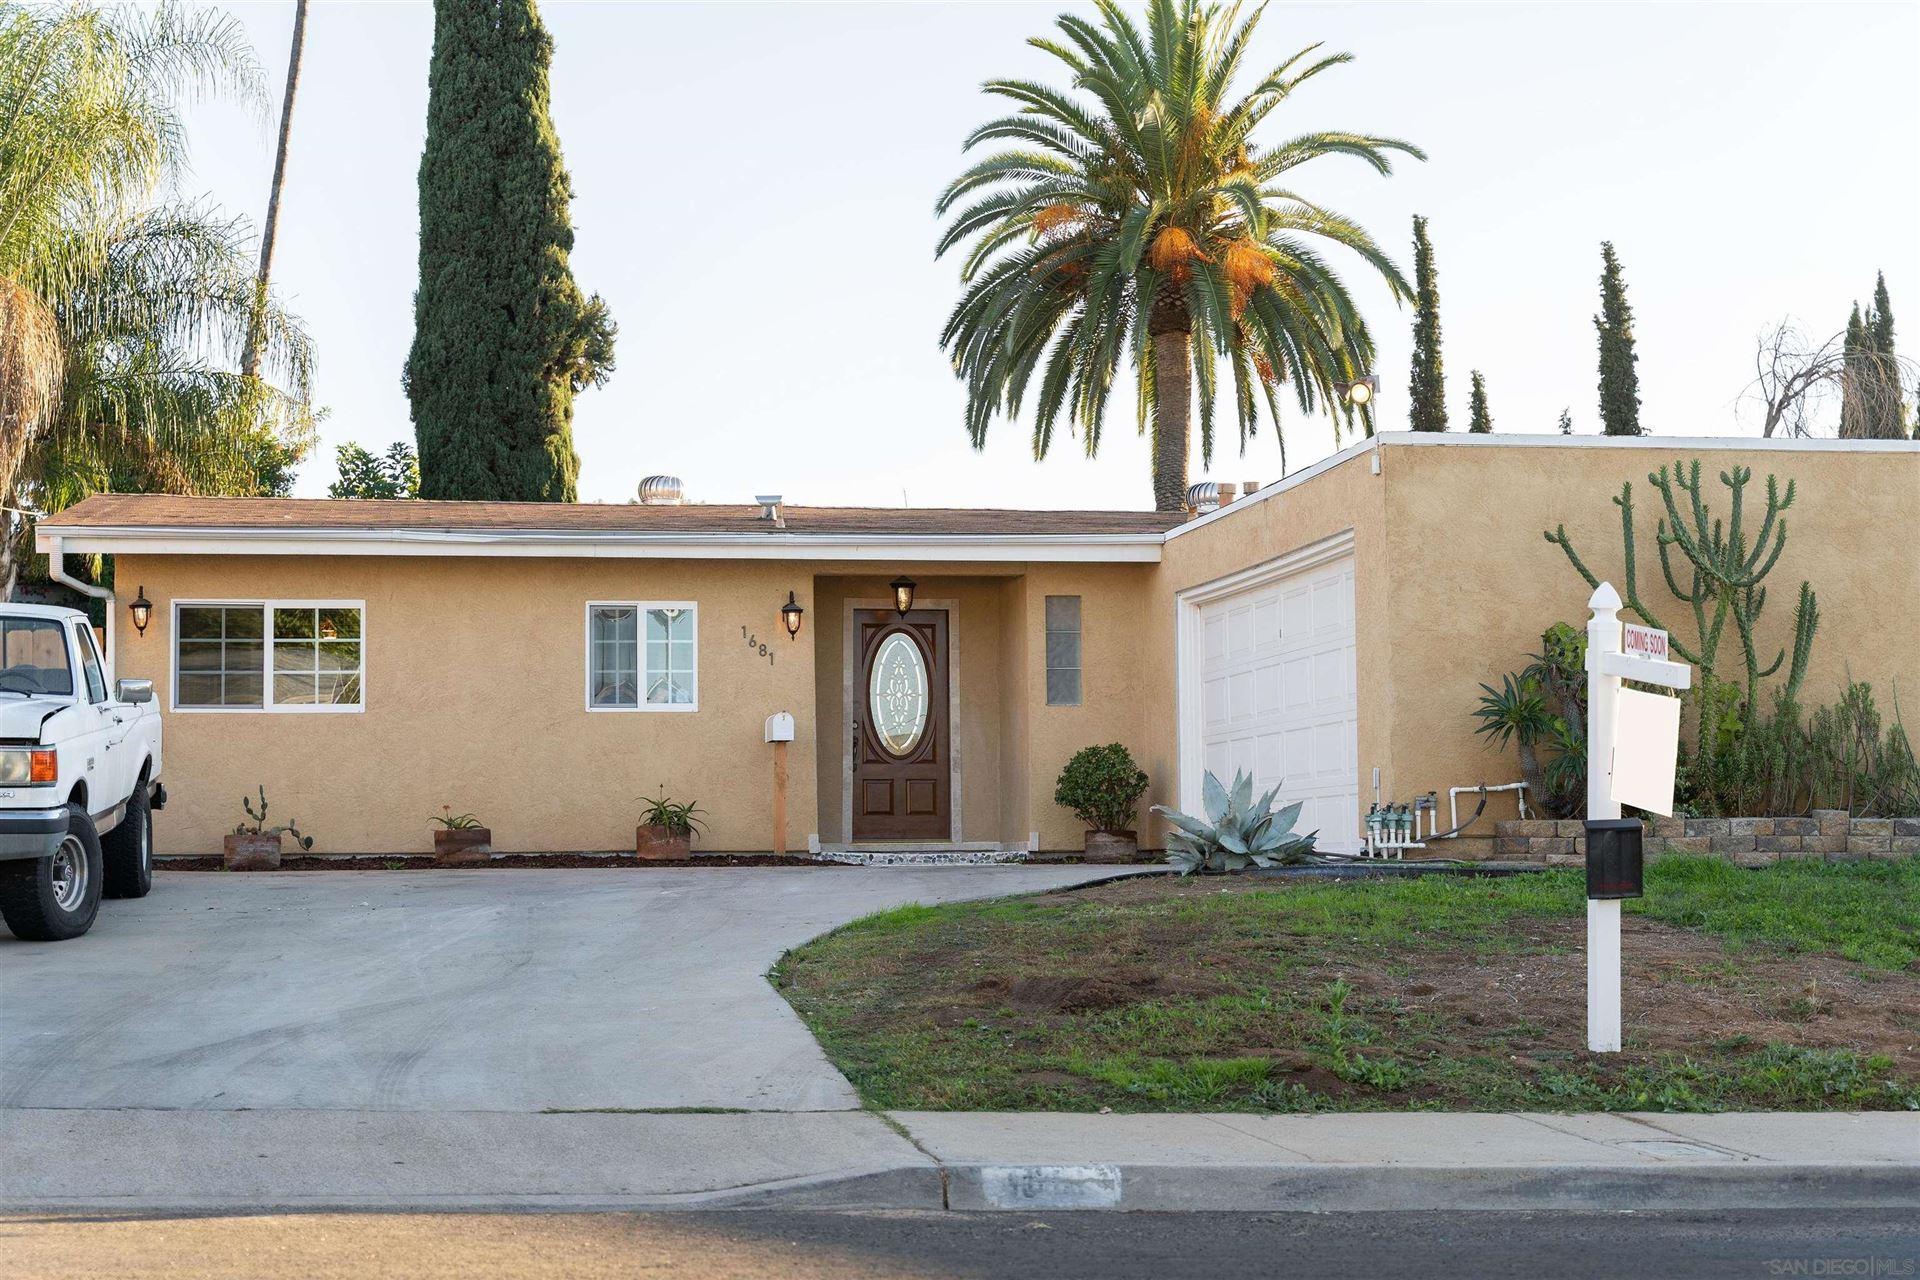 Photo of 1681 Raynell Way, El Cajon, CA 92019 (MLS # 210026089)